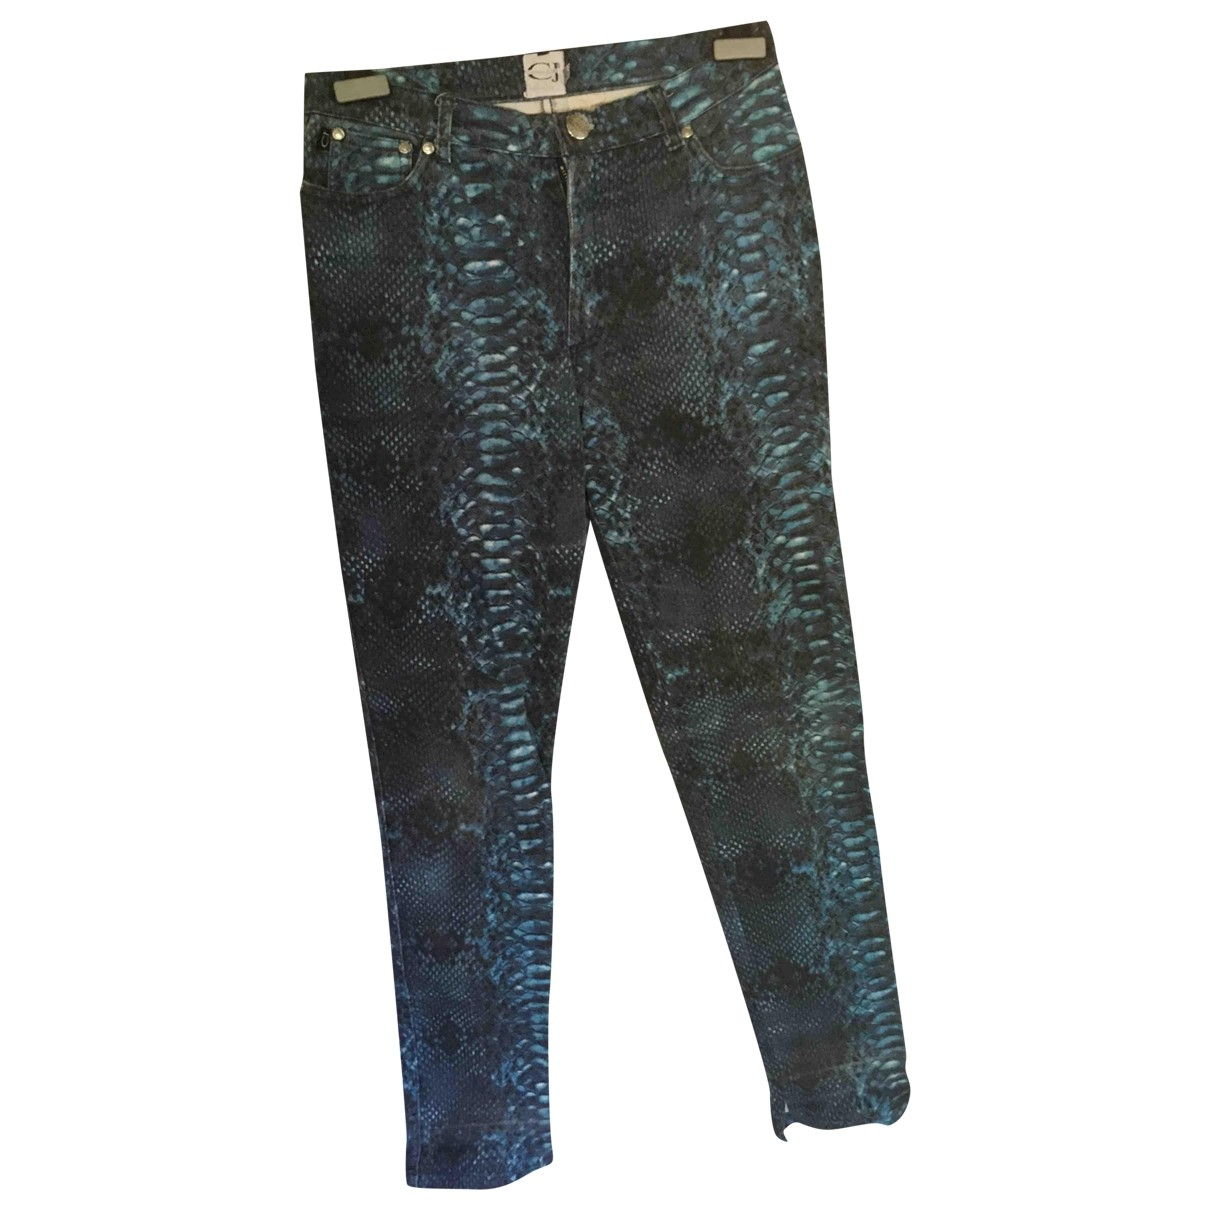 Roberto Cavalli \N Multicolour Denim - Jeans Trousers for Women 32 FR